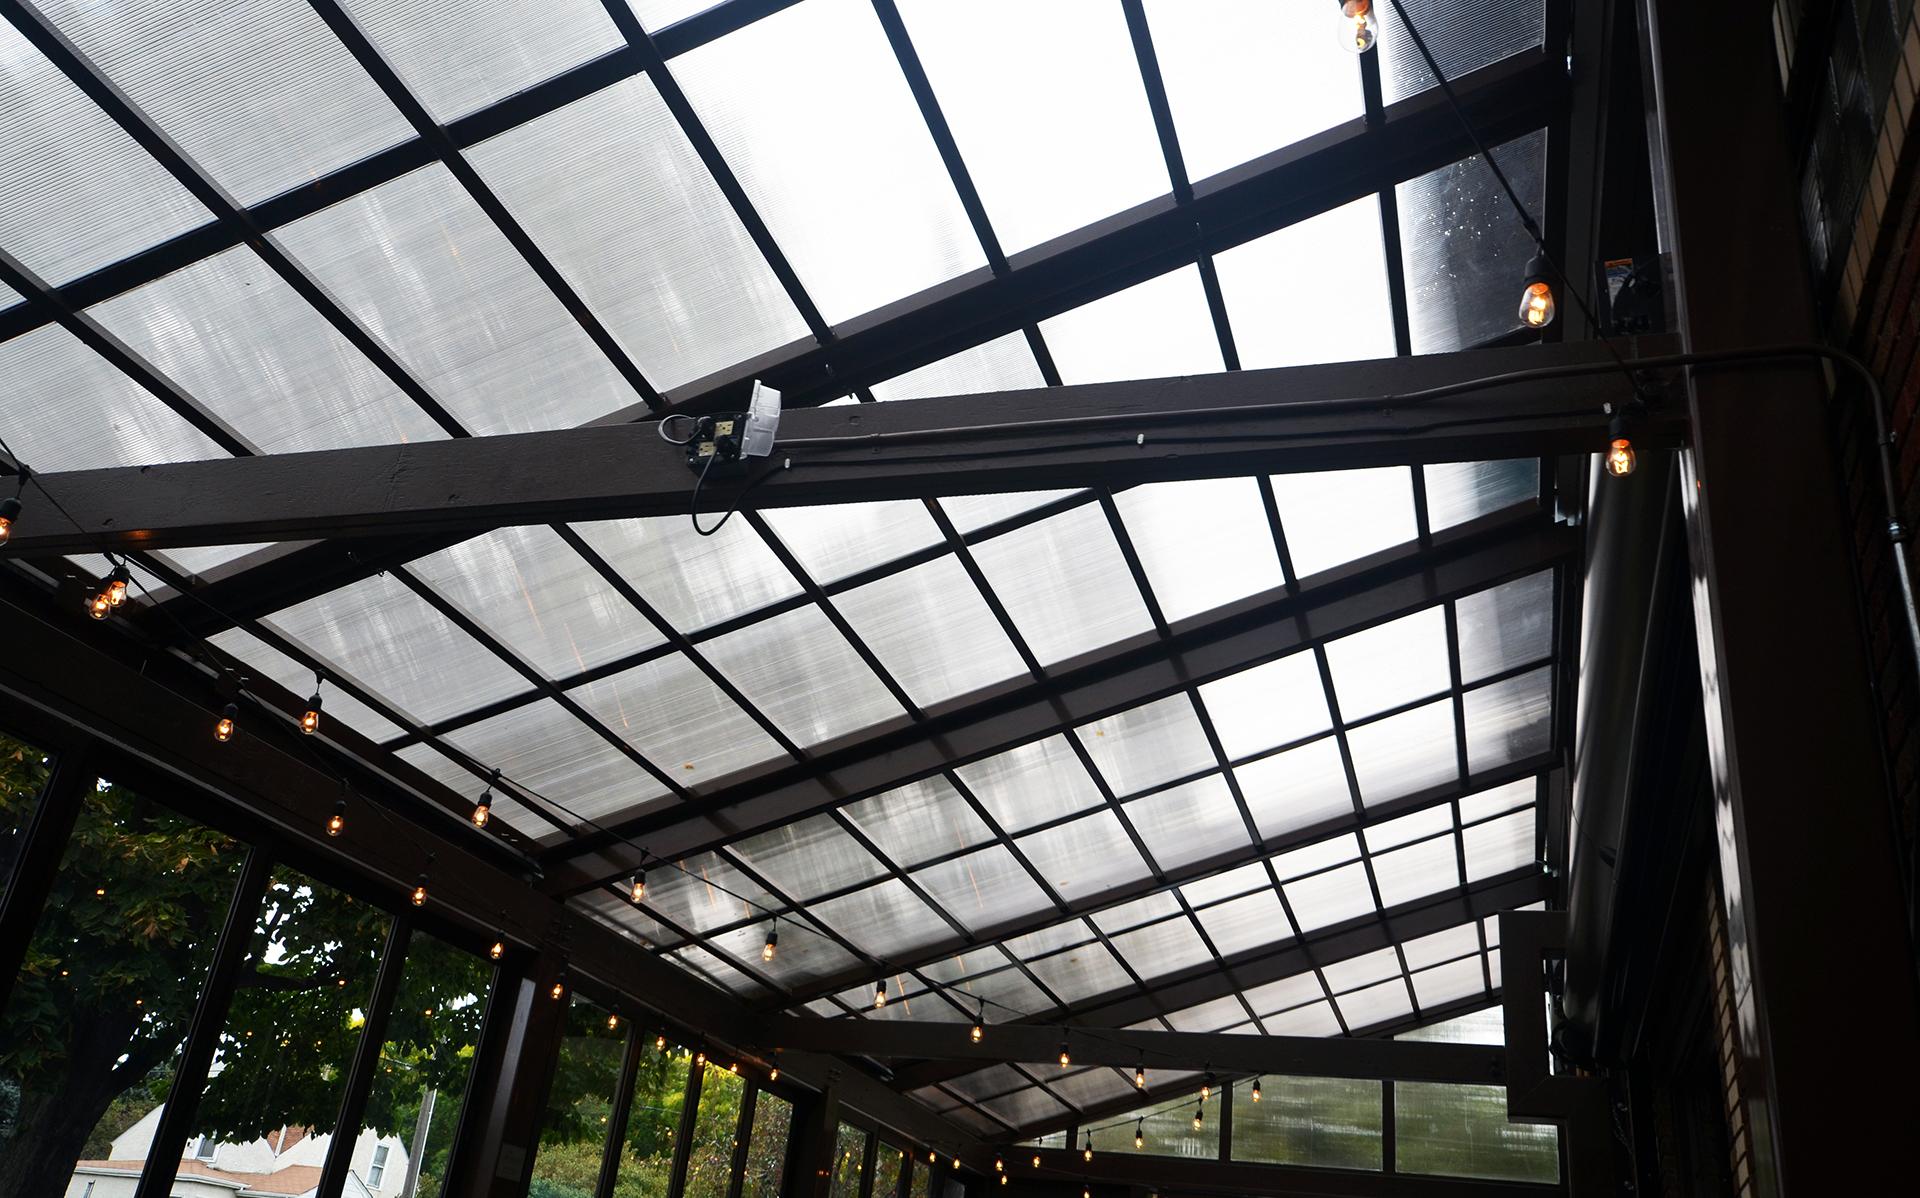 Translucent retractable roof on restaurant patio